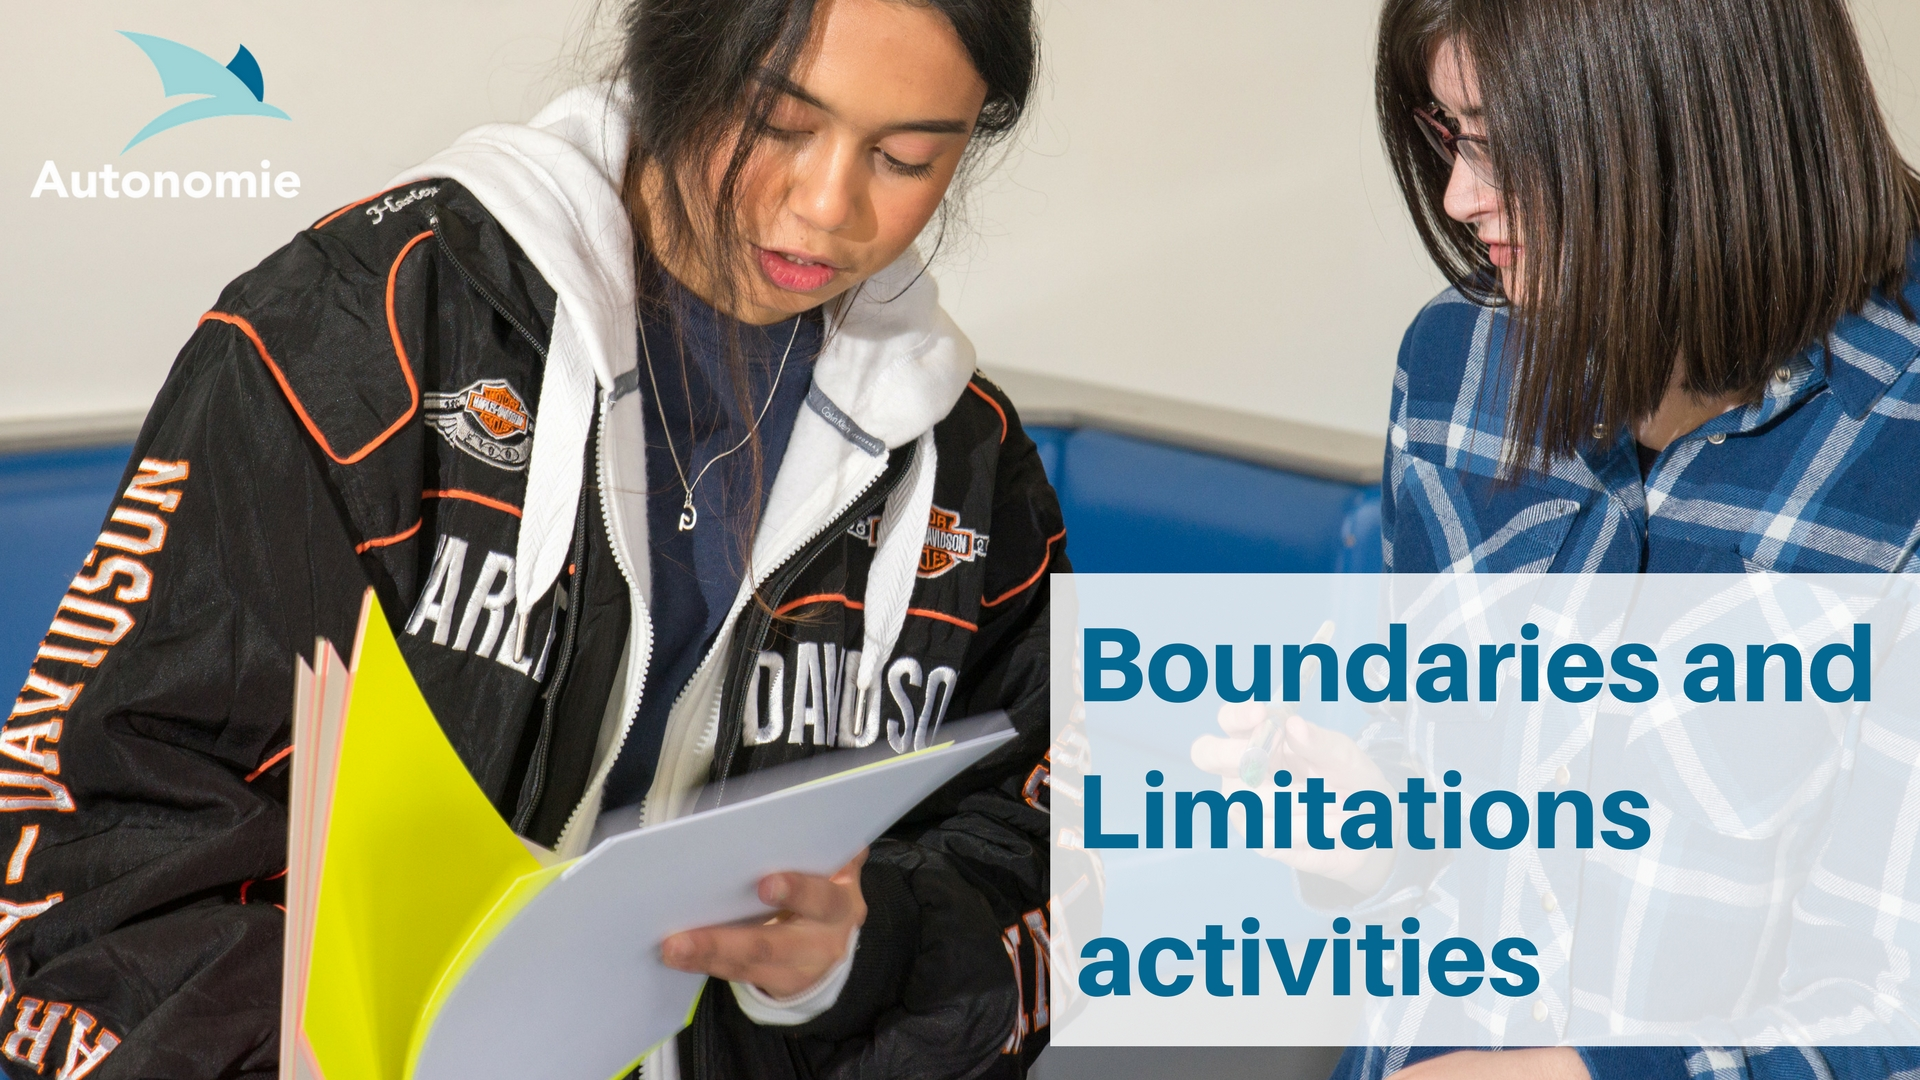 BoundariesLimitations.jpg